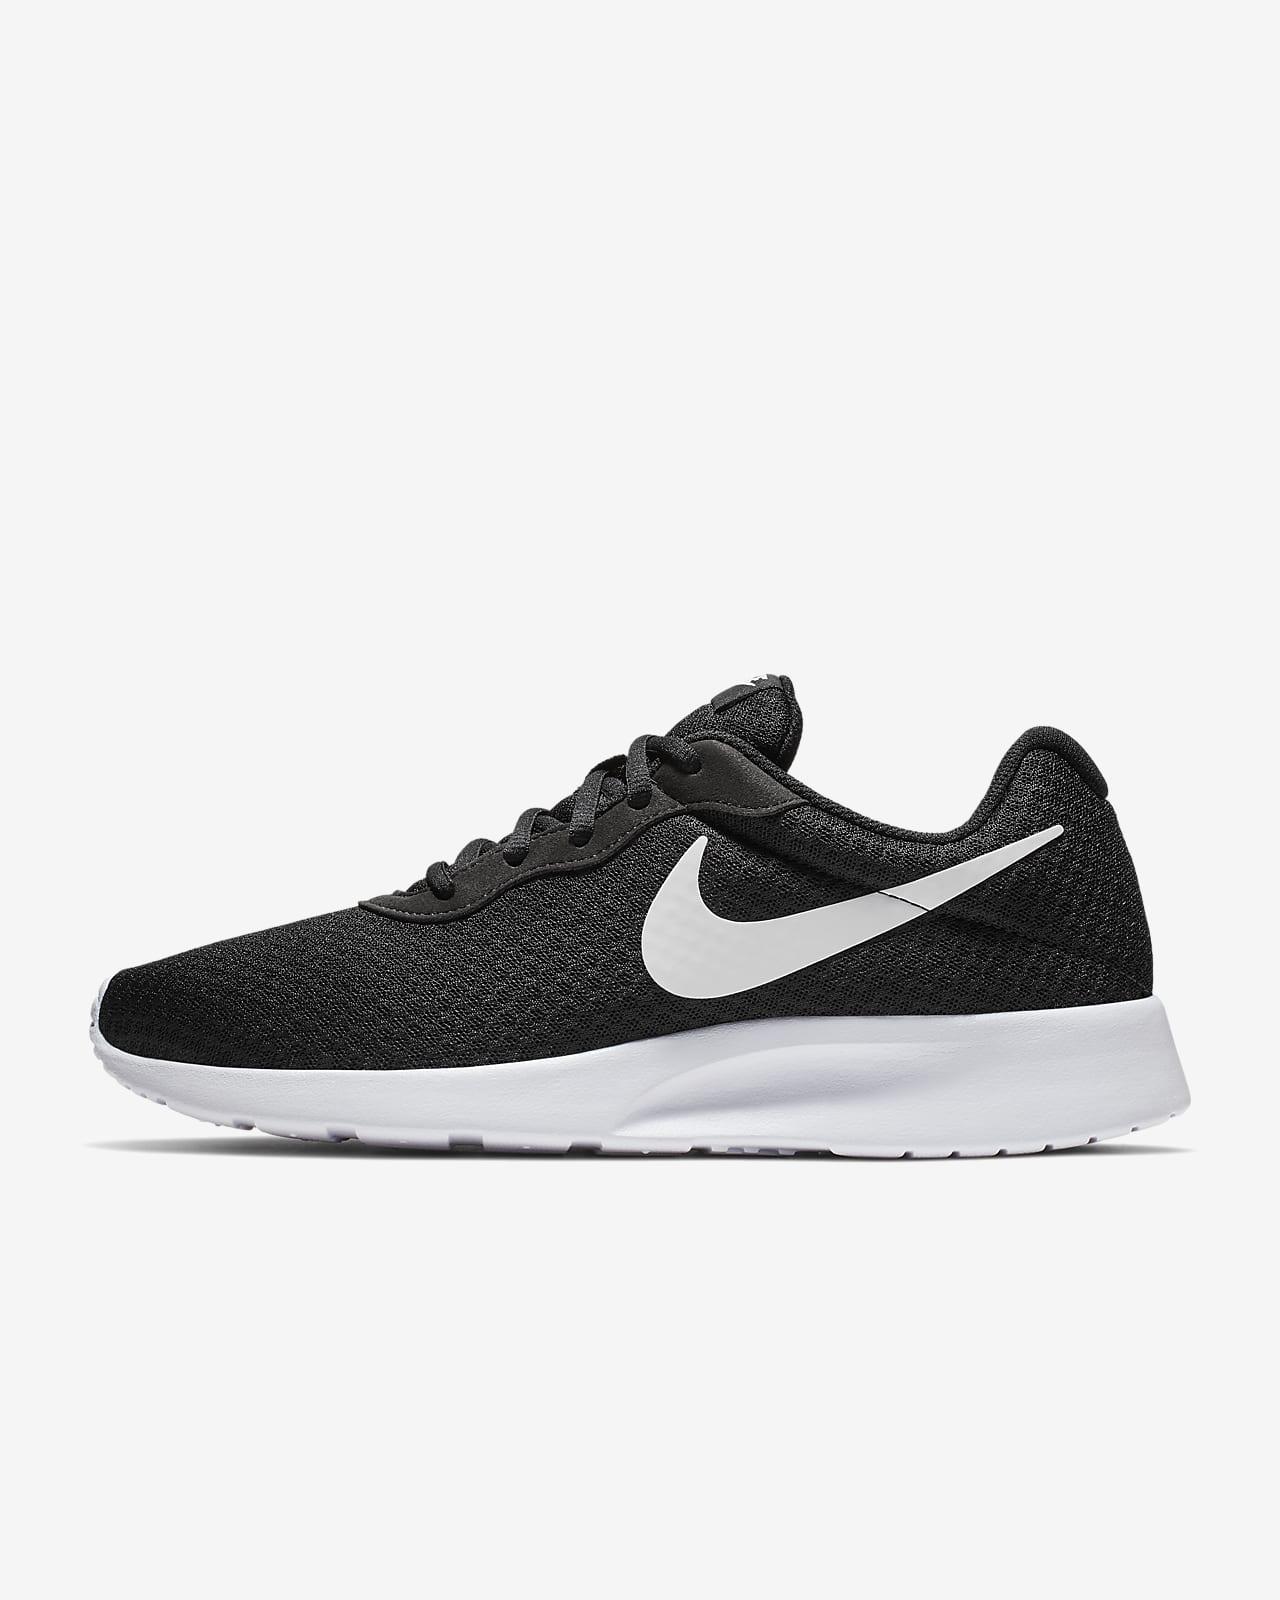 Nike Tanjun Men's Shoe. Nike LU